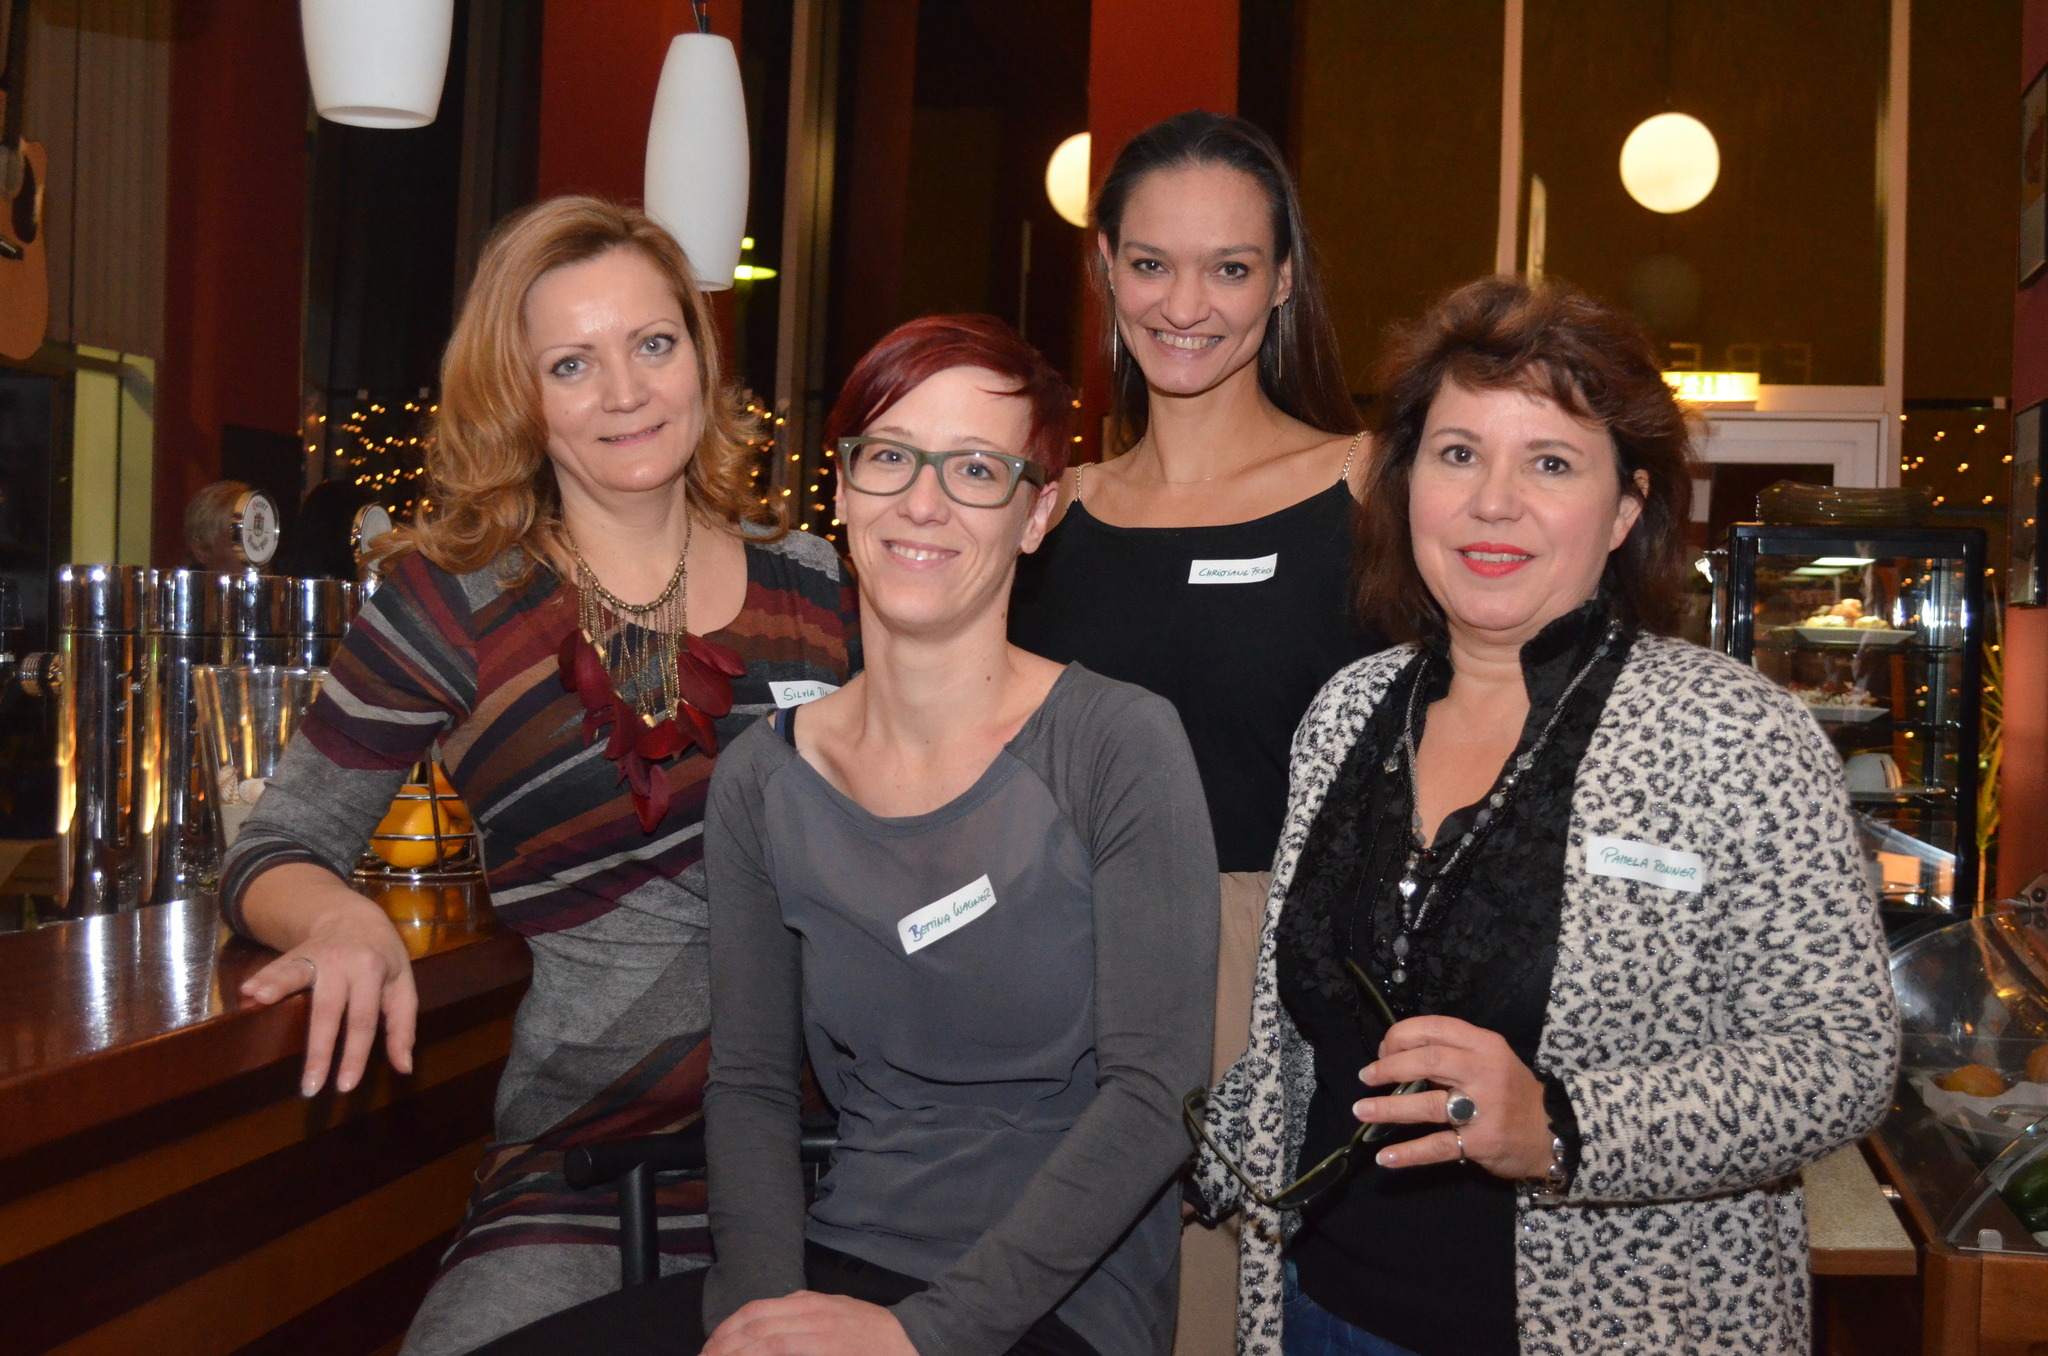 Singlebrse in Semriach bei Graz-Umgebung und Singletreff